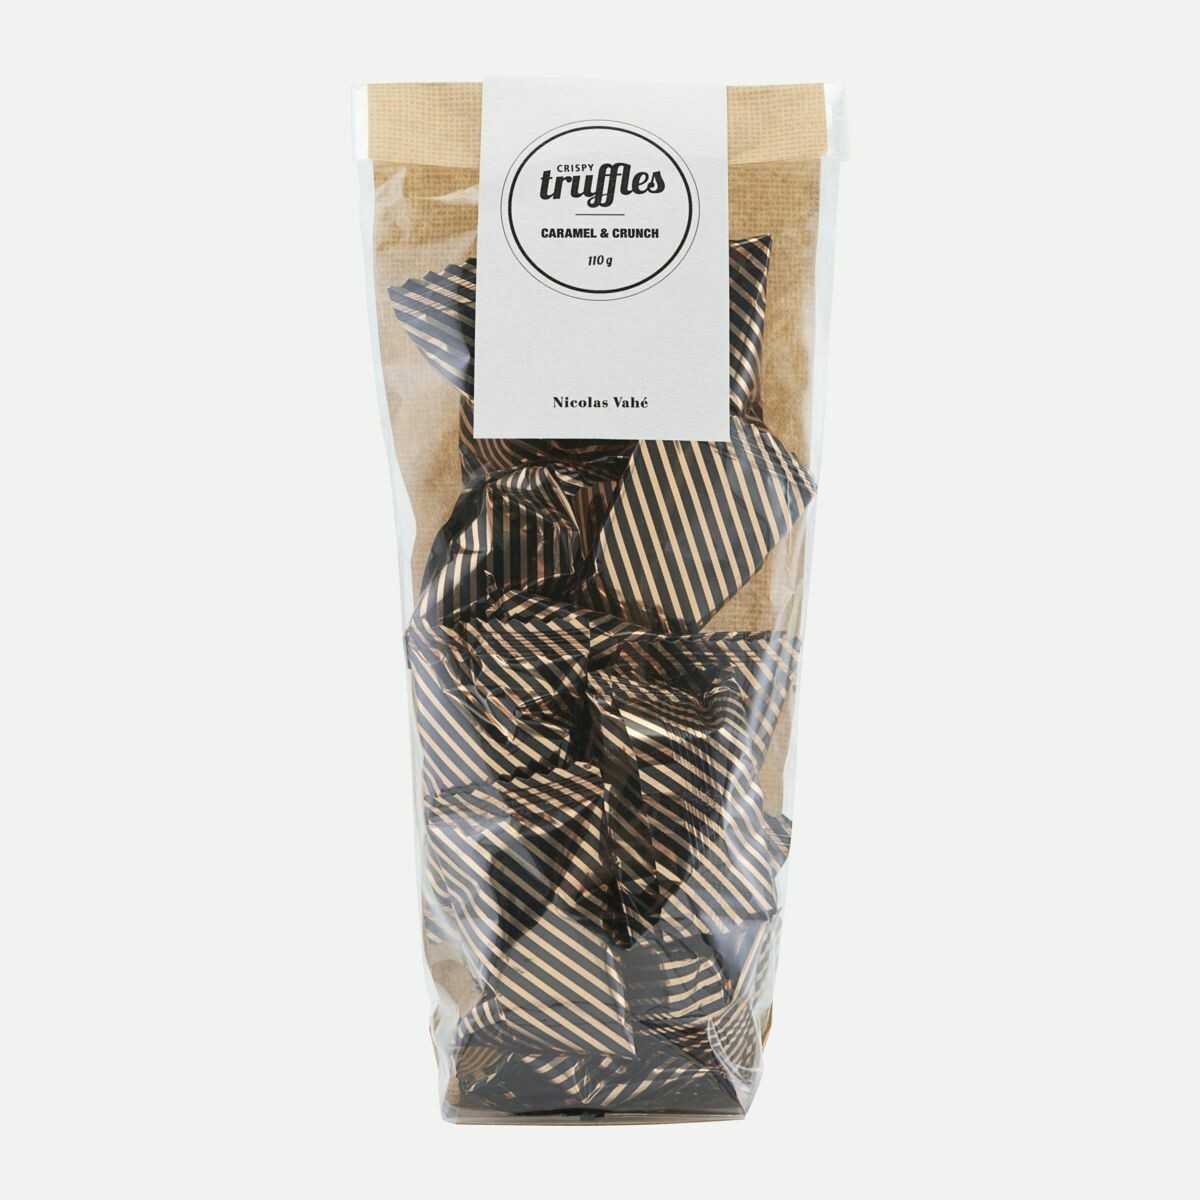 Chocolate Truffles - Caramel & Crunch